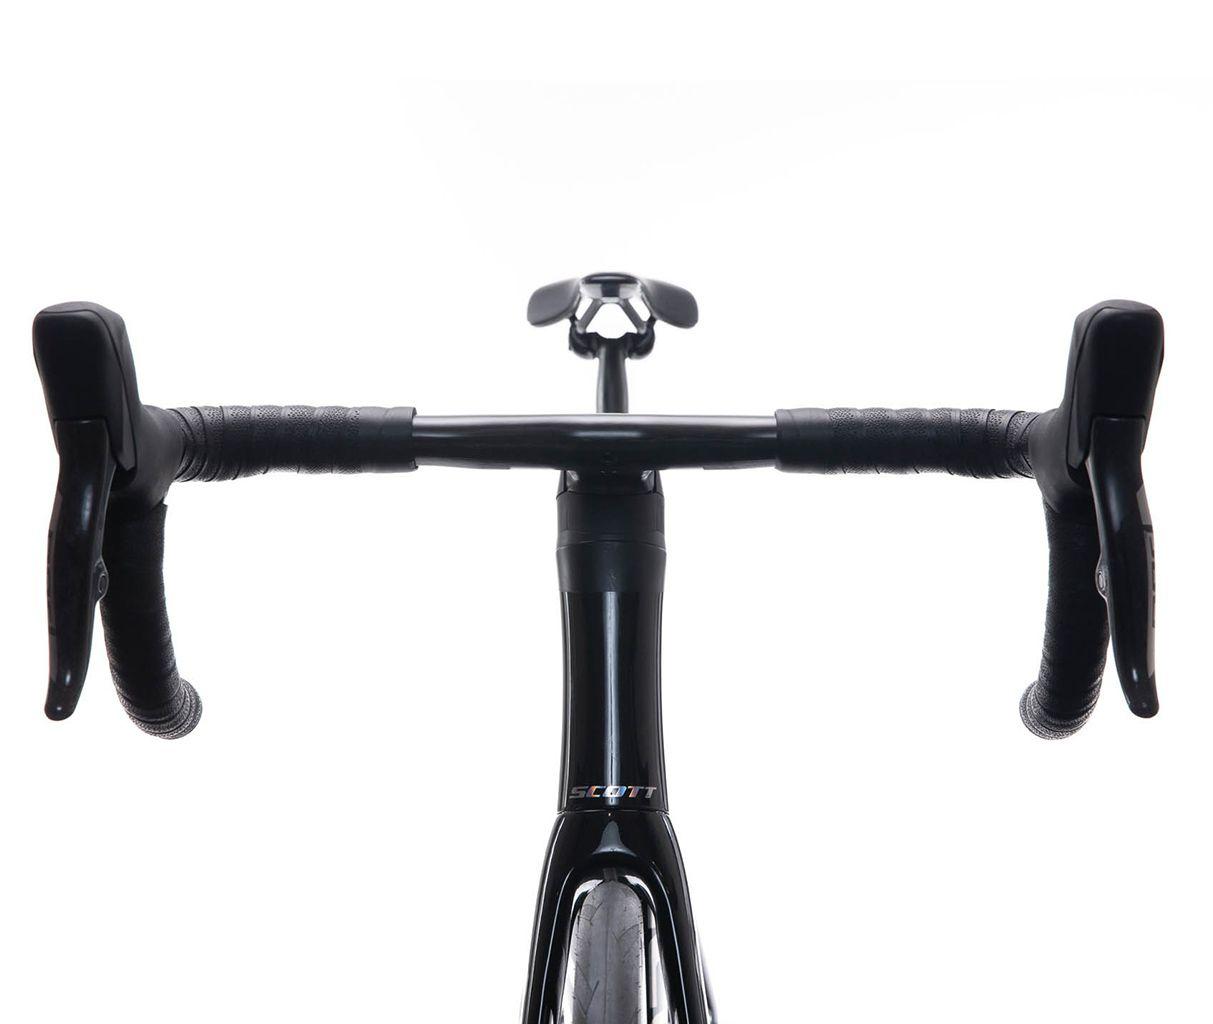 Bici strada Bicicletta Scott Addict RC Ultimate